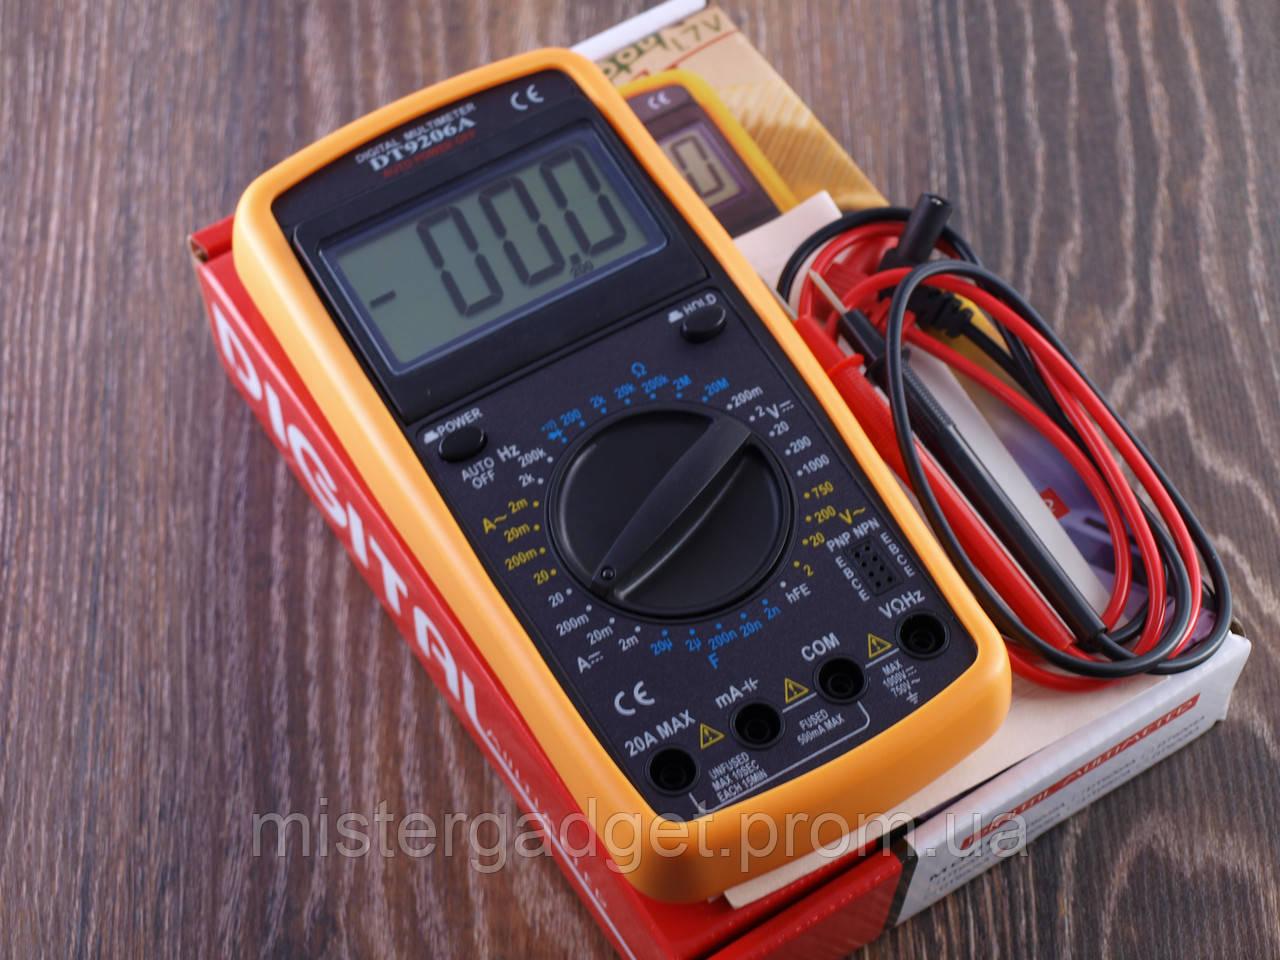 Мультиметр цифровий DT 9206 20А, Тестер DT-9206A